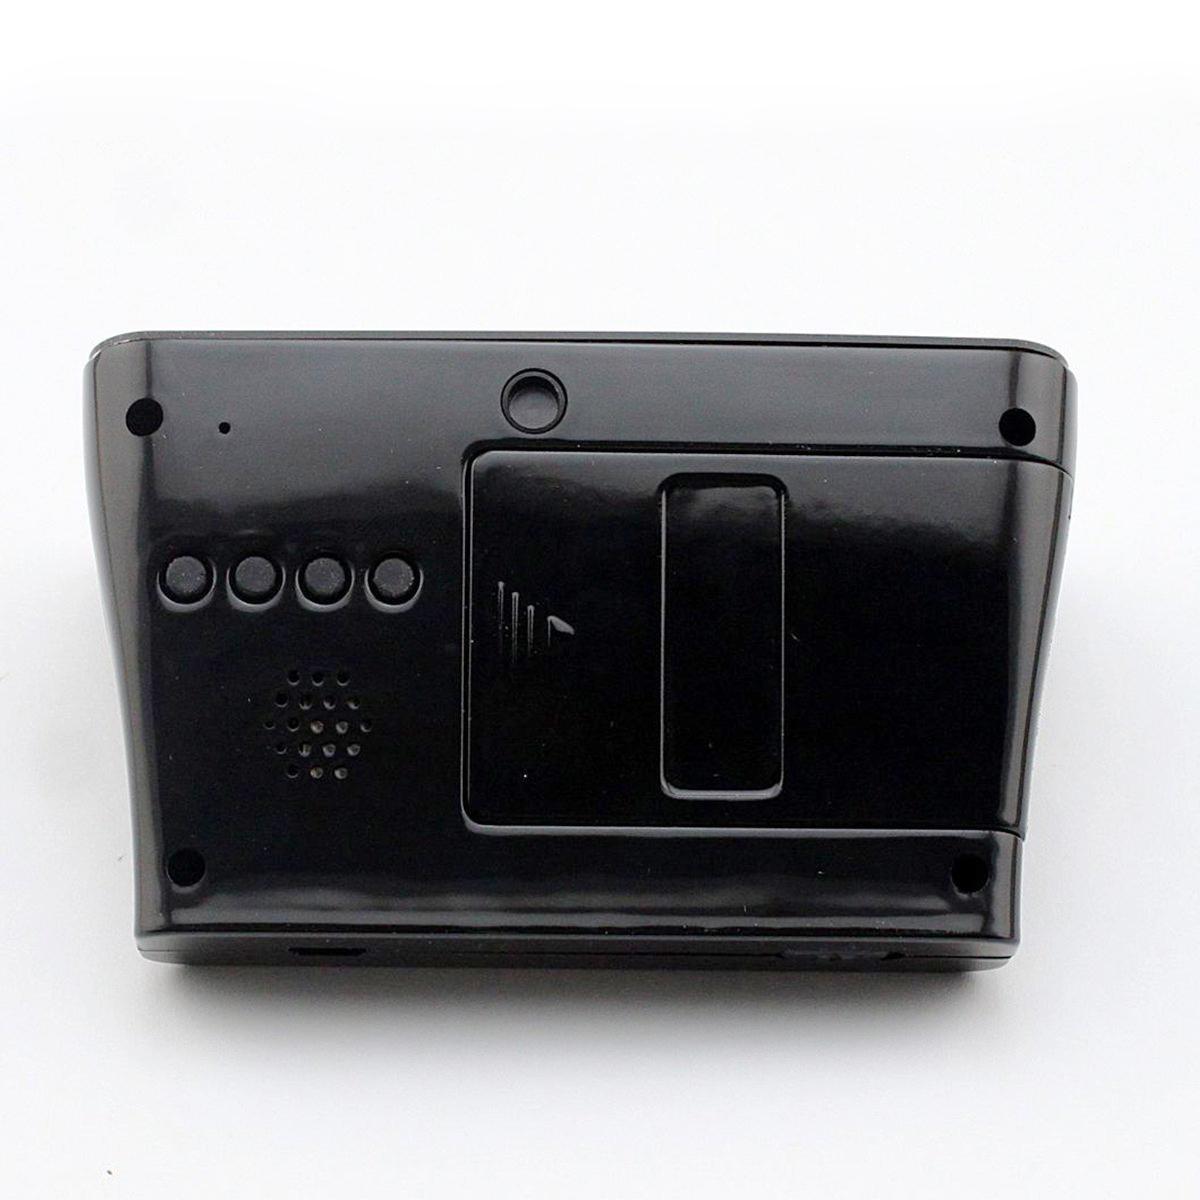 Wifi Ip Mini Clock Dvr Alarm Wireless Camera Spy Hidden